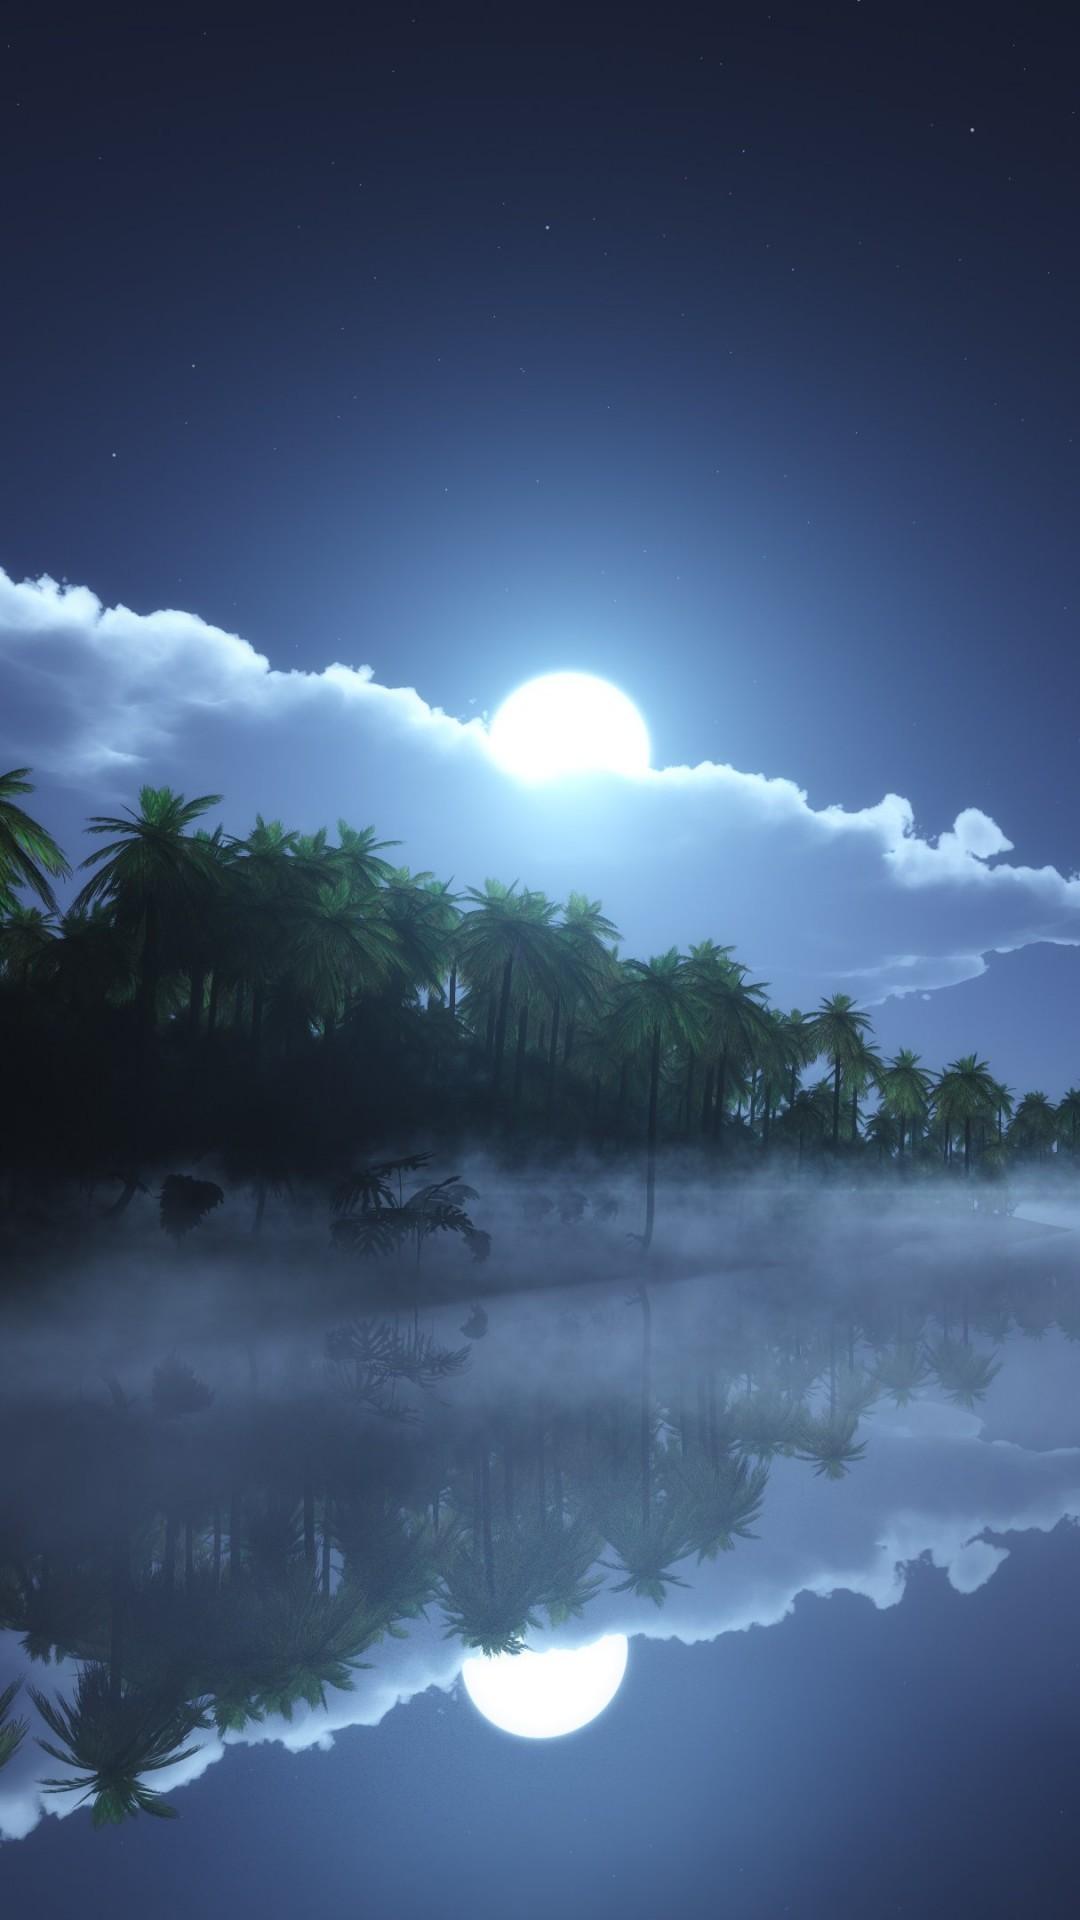 Wallpaper River 4k Hd Wallpaper Sea Palms Night Moon